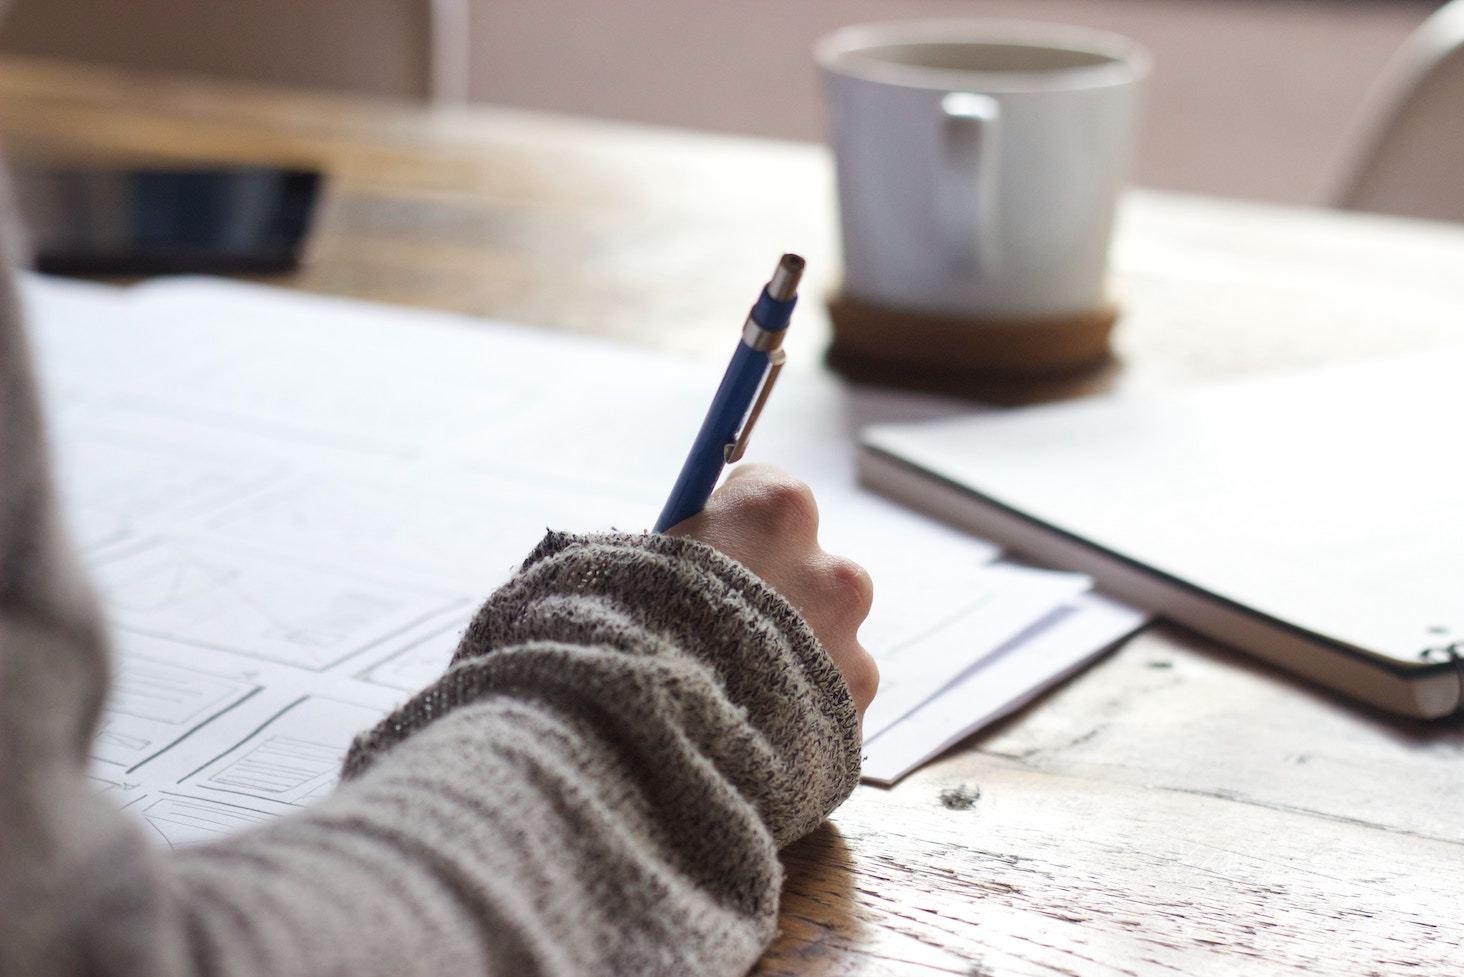 Hand holding pen at desk